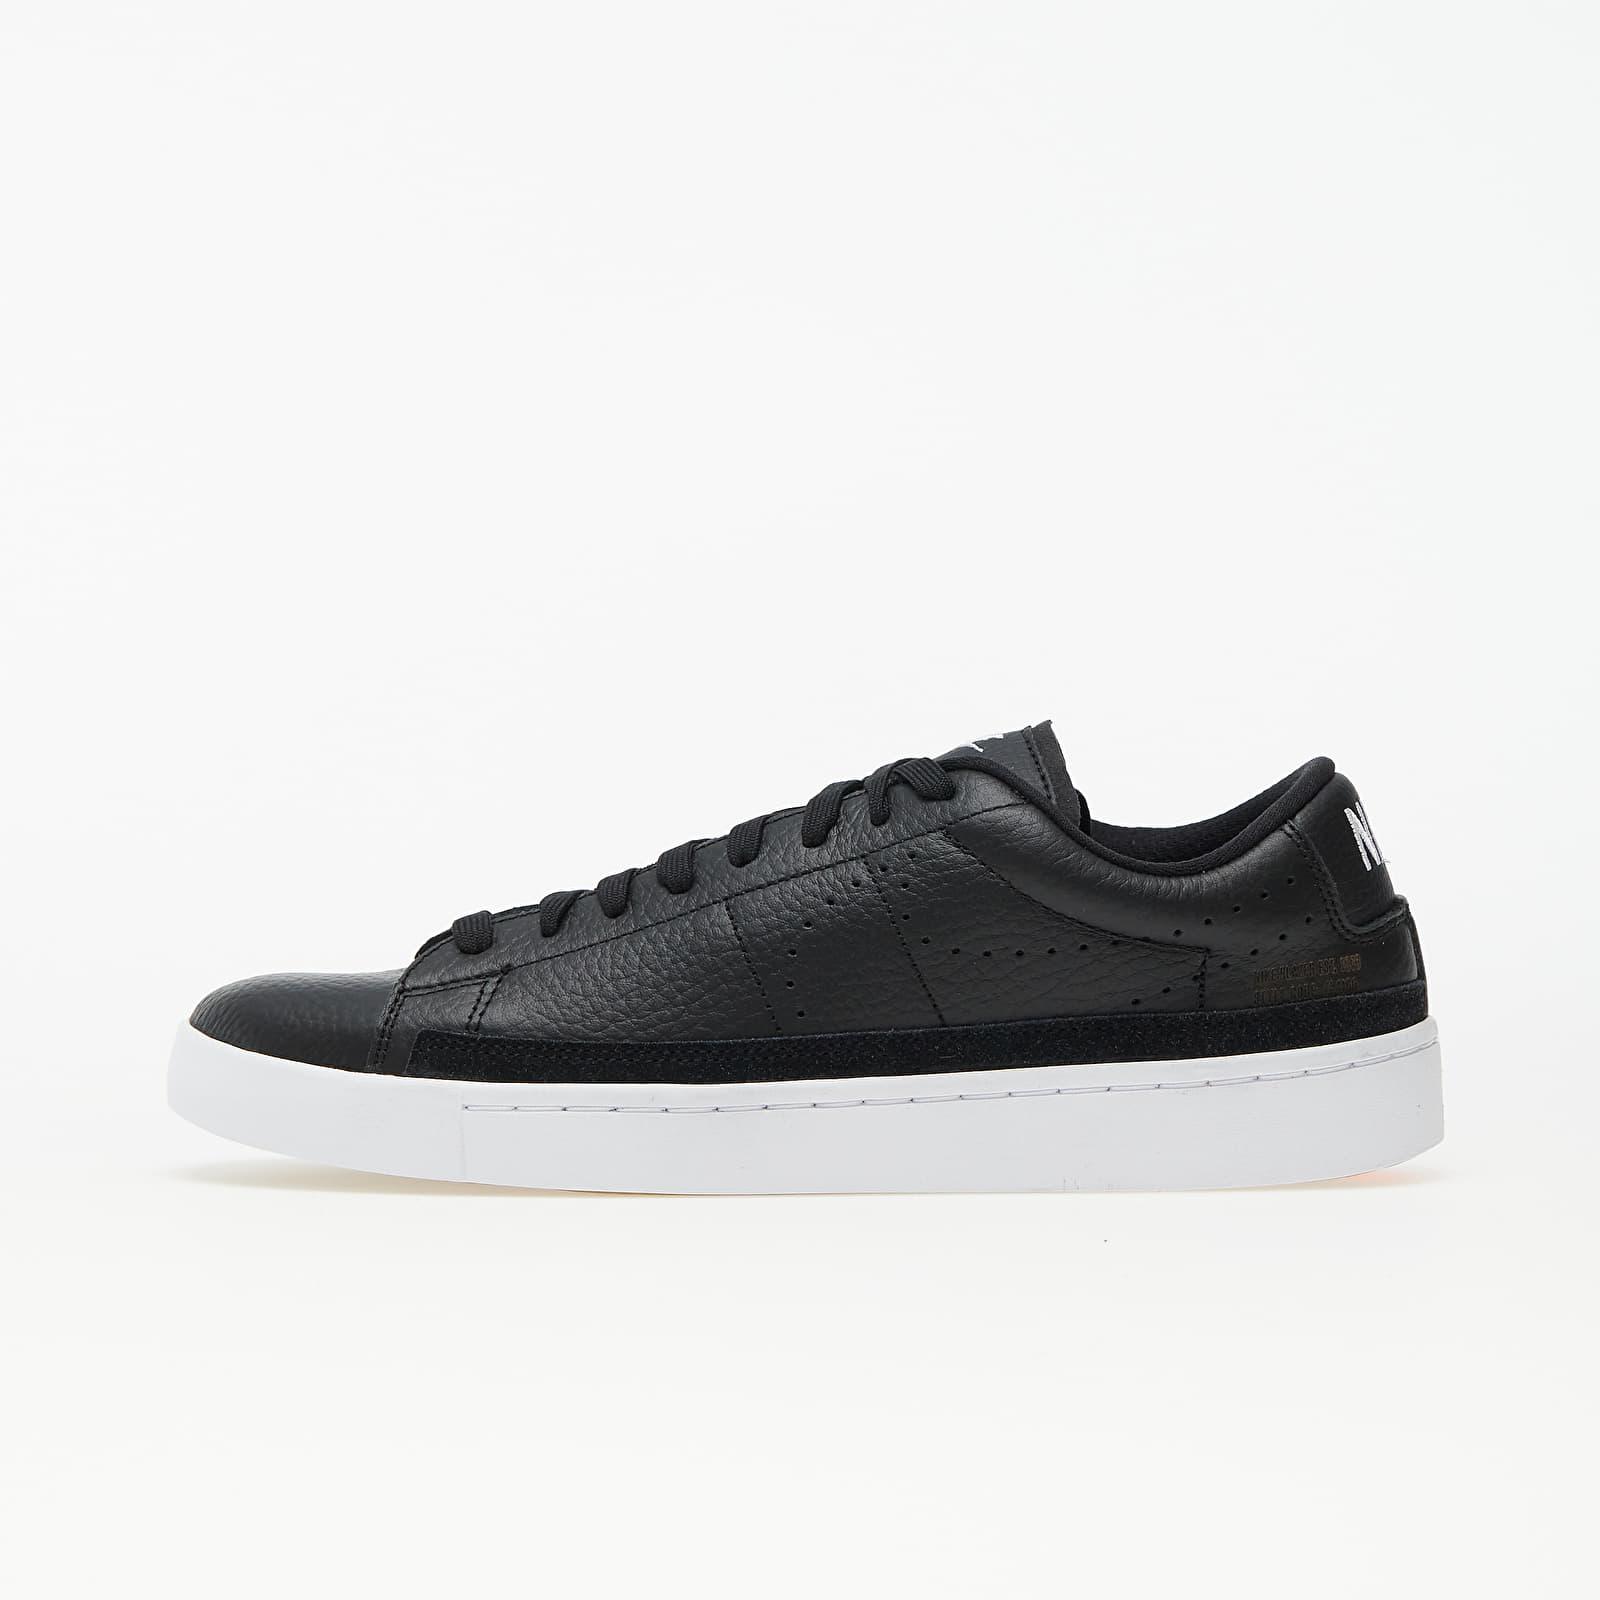 Nike Blazer Low X Black/ White-Gum Light Brown-Orange EUR 45.5